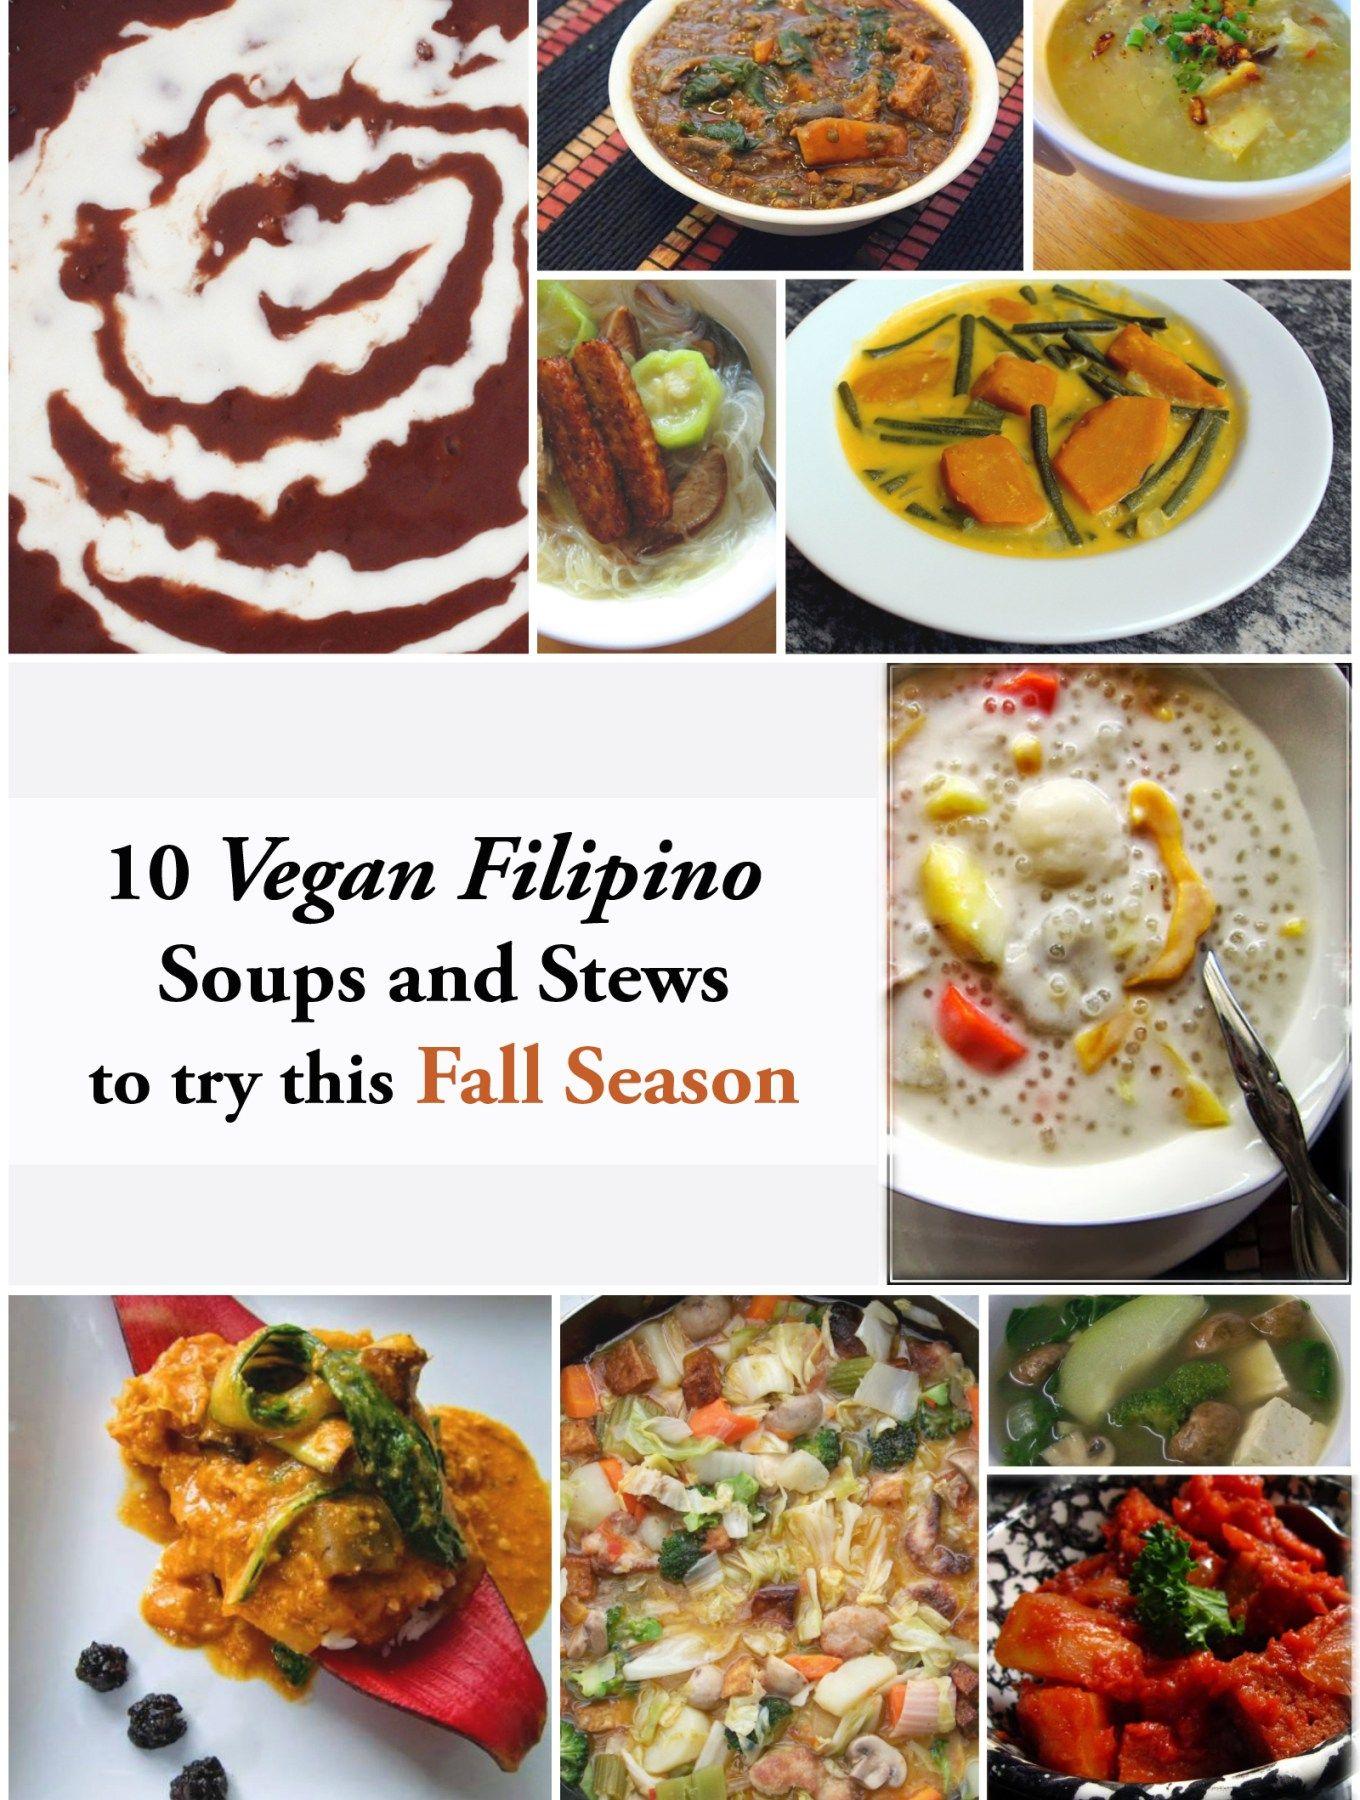 Vegan Filipino Food Vegetarian Recipes Vegan Recipes Healthy Soups And Stews